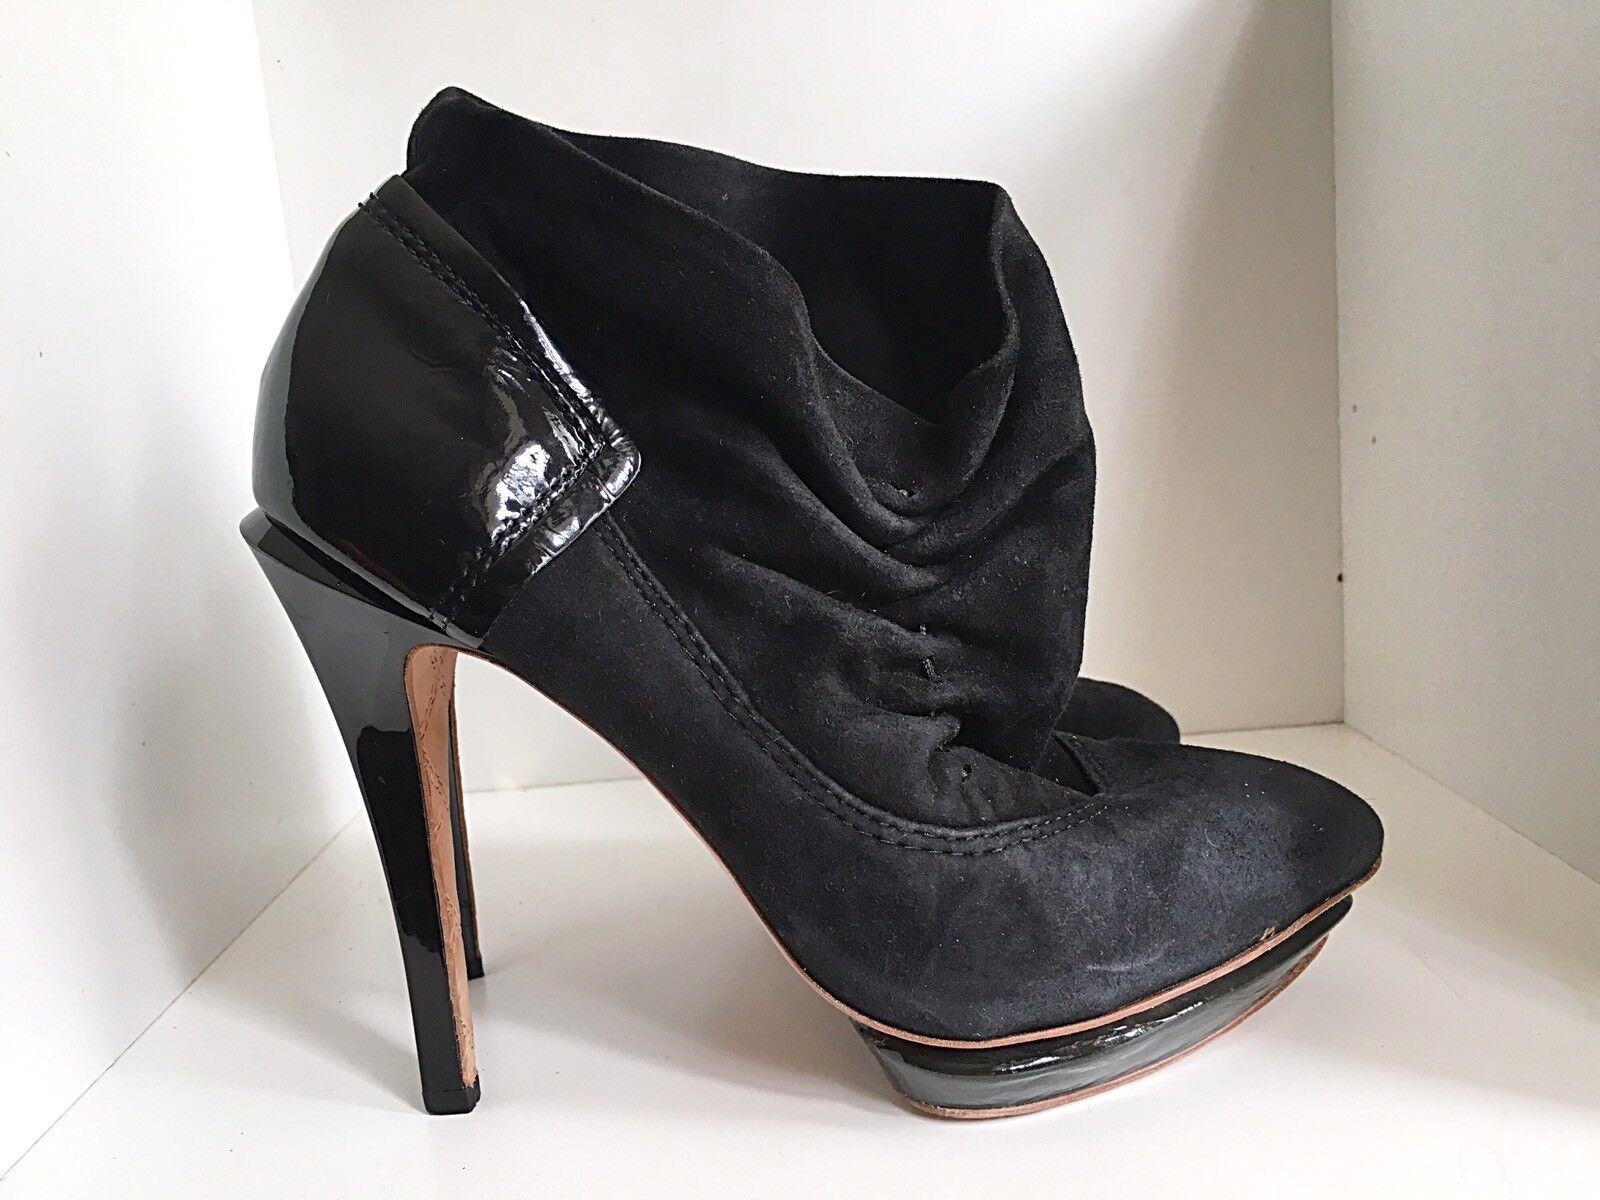 LAMB LAMB LAMB Booties Black Suede Leather 7 M cefe40